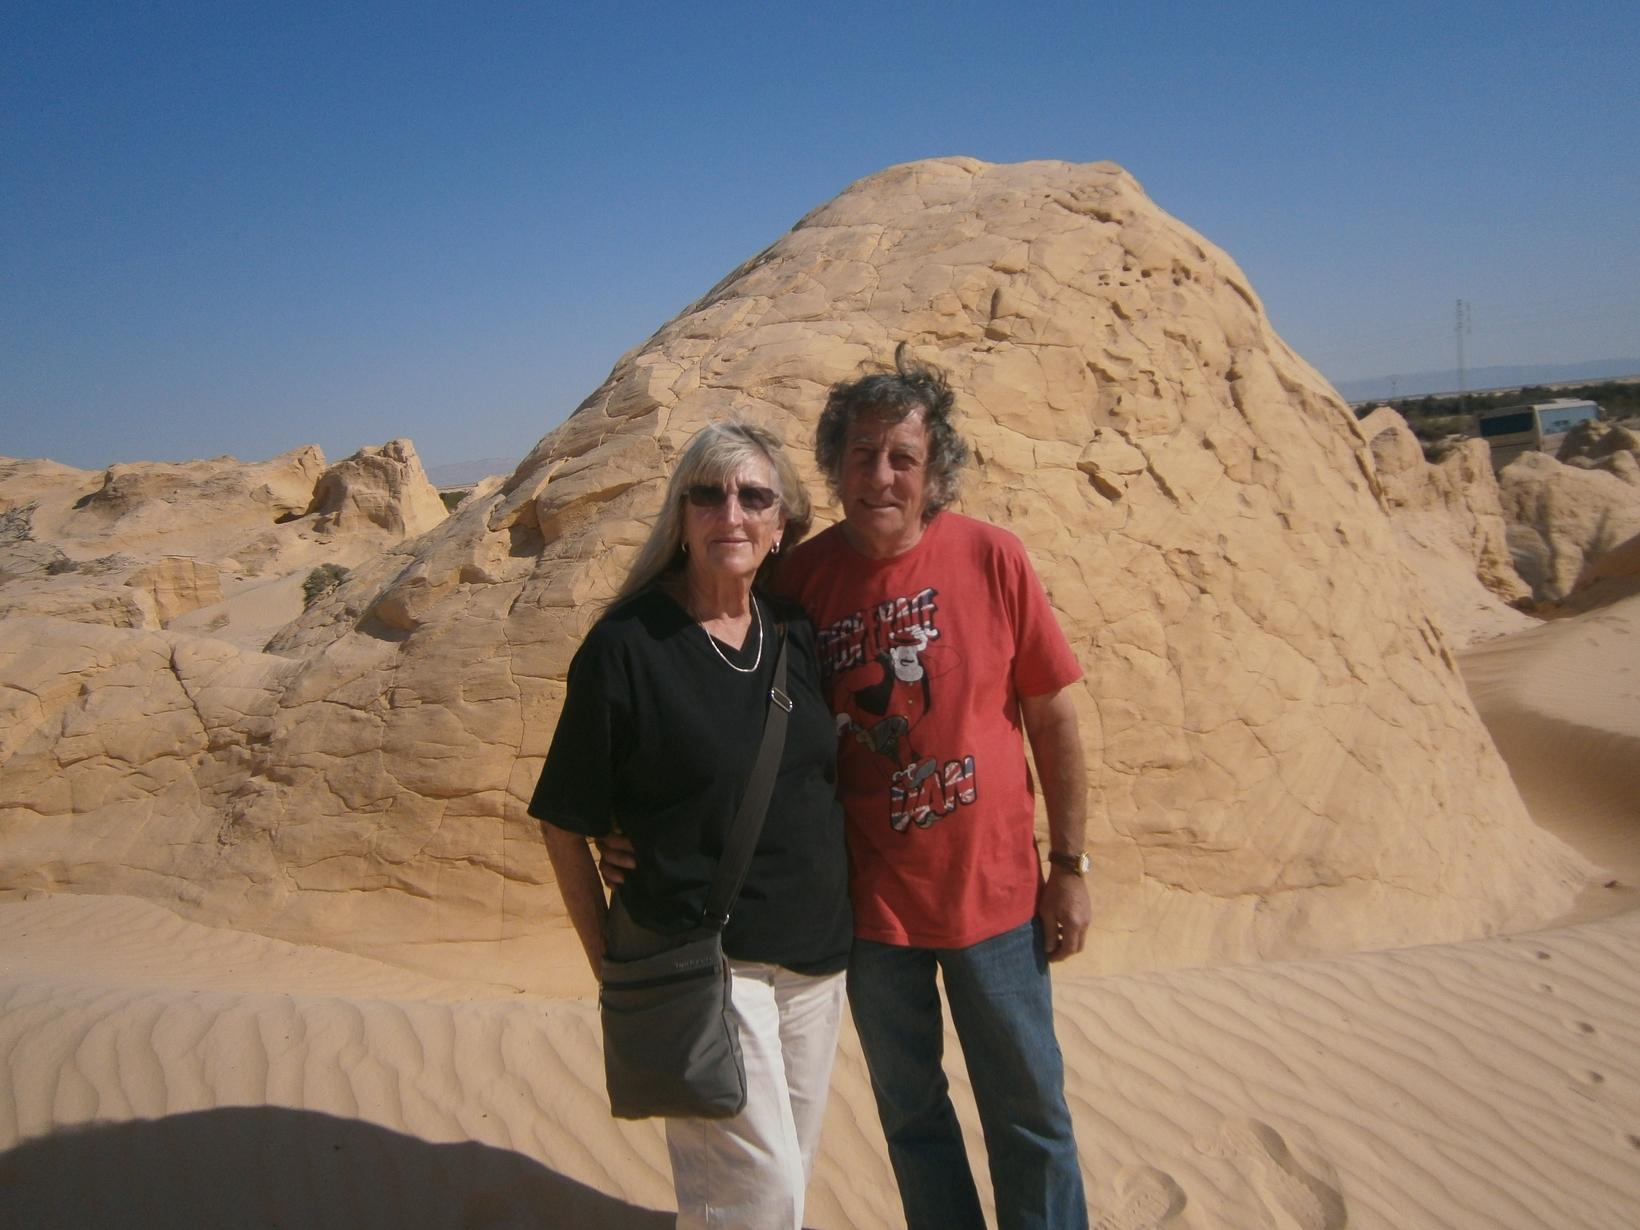 Bunty & John from Binda, New South Wales, Australia